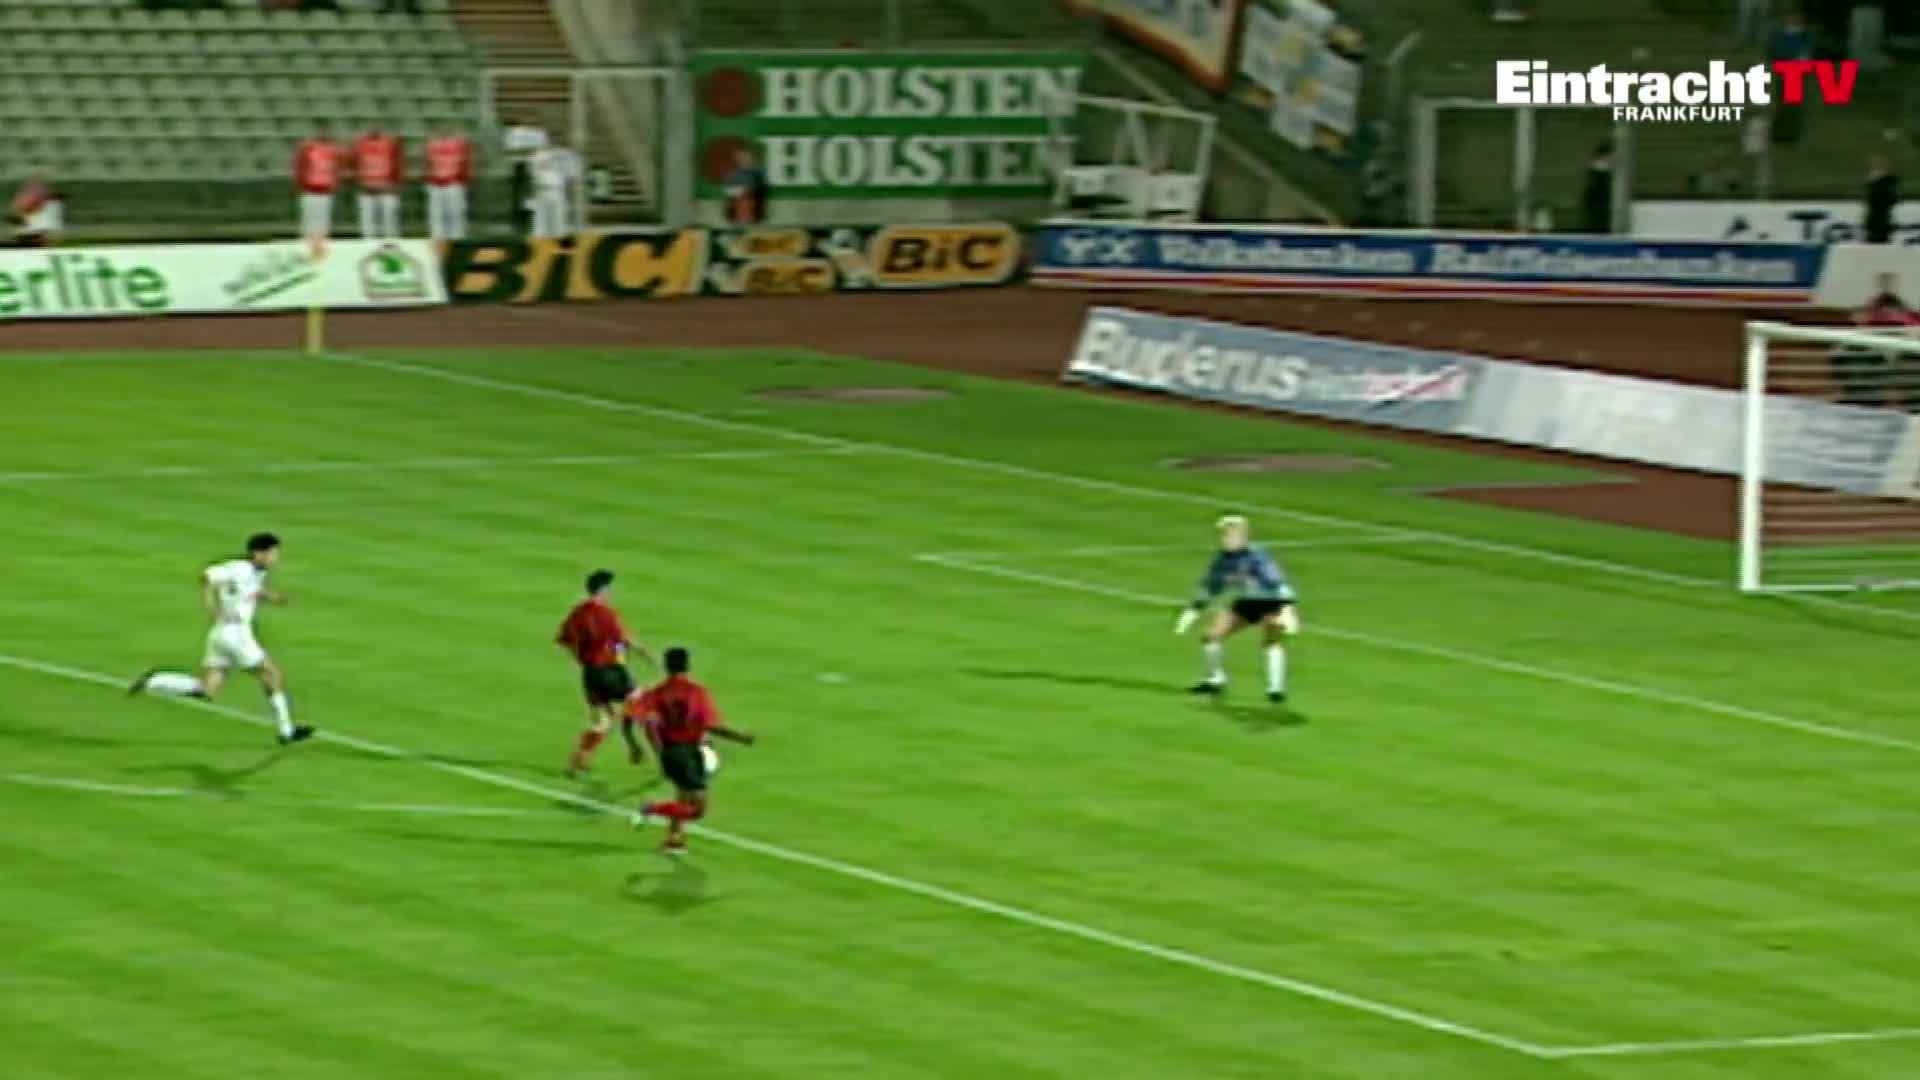 Adler, Eintracht, Eintracht Frankfurt, Frankfurt, SGE, football, fussball, official, offiziell, soccer, TBT | Okocha-Jahrhunderttor 1993 | Eintracht - Karlsruhe GIFs